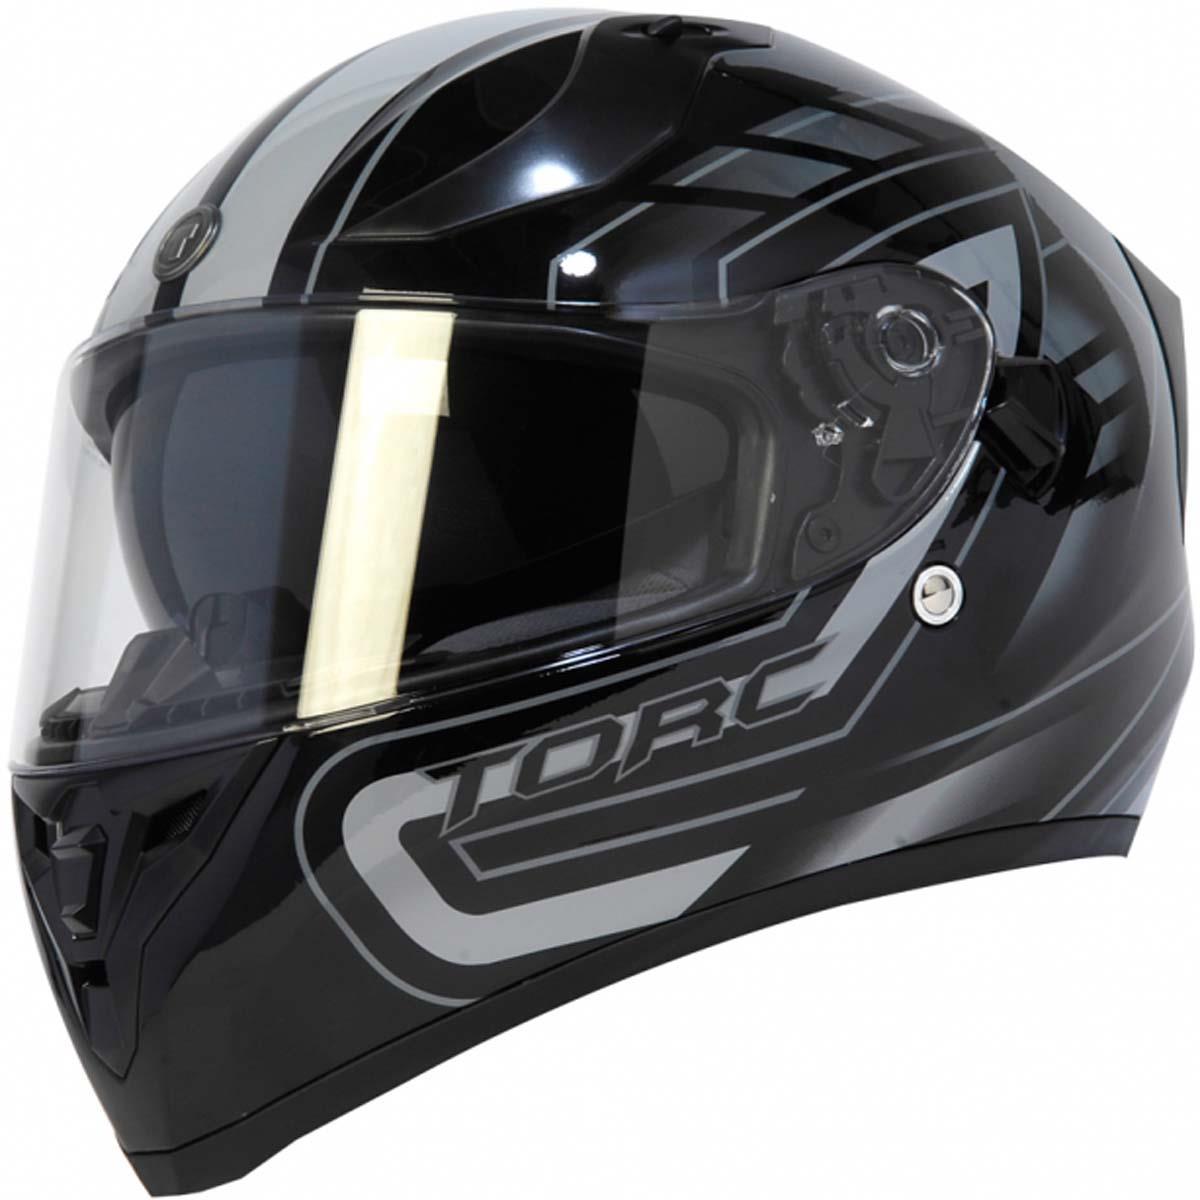 miniature 33 - Torc T15 T15B Helmet Bluetooth Blinc or without - Inner Sun Shield DOT XS-2XL